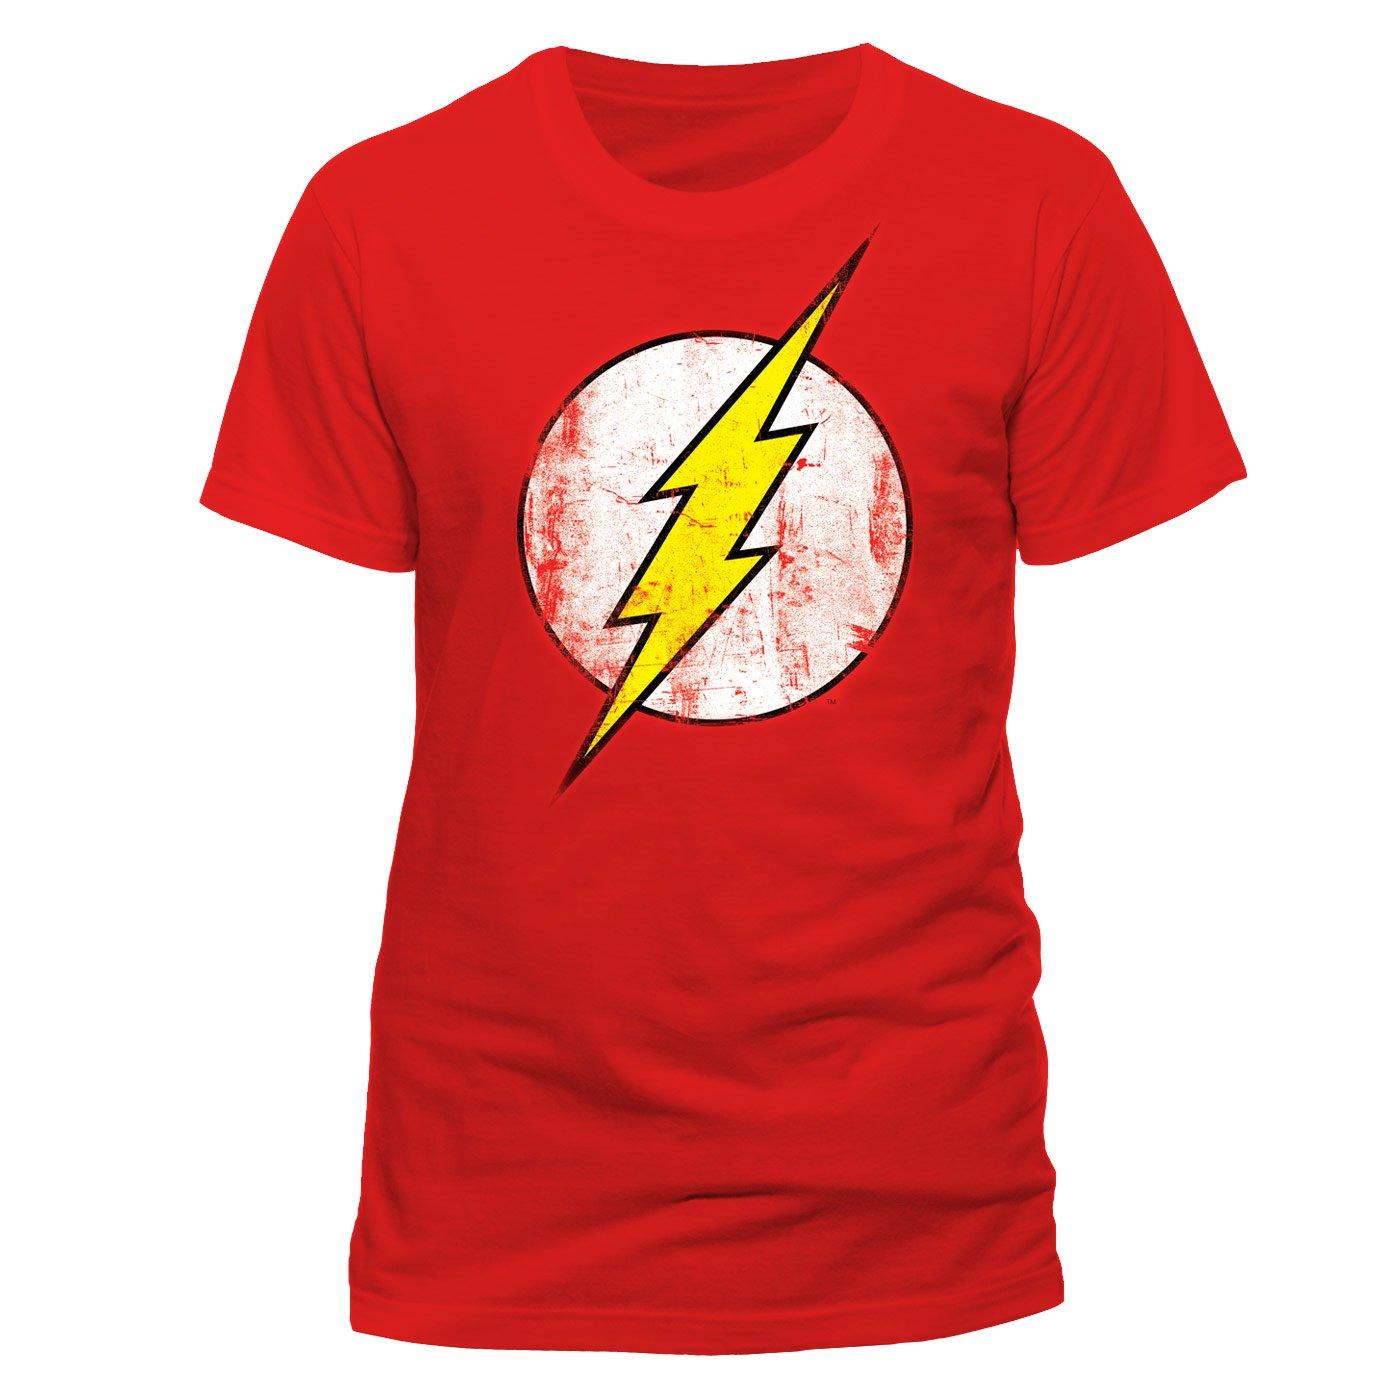 Cid The Flash - Distressed Logo - T-Shirt - Homme CIDAJ #CID Pe10793Tscp